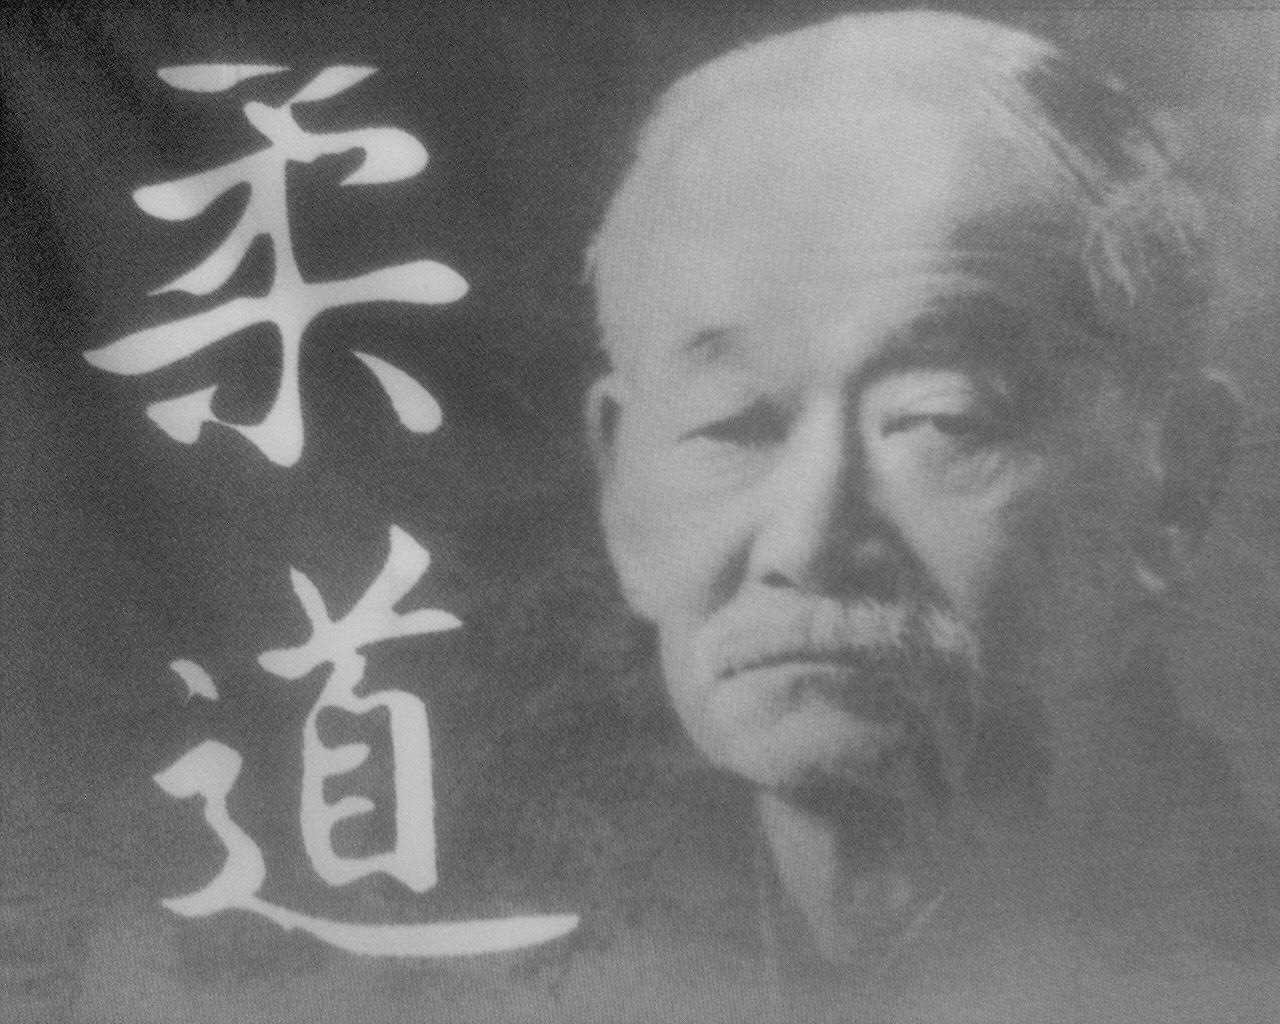 Jigoro Kano, fondateur du Judo